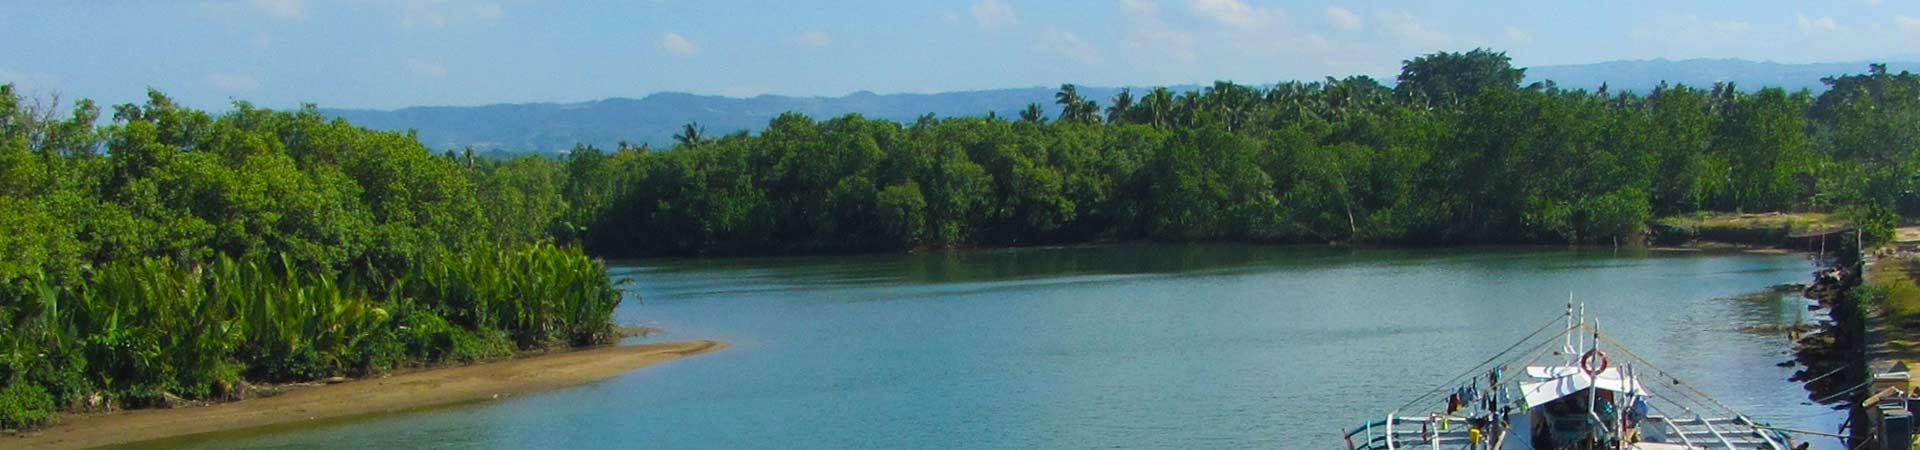 Bayawan City